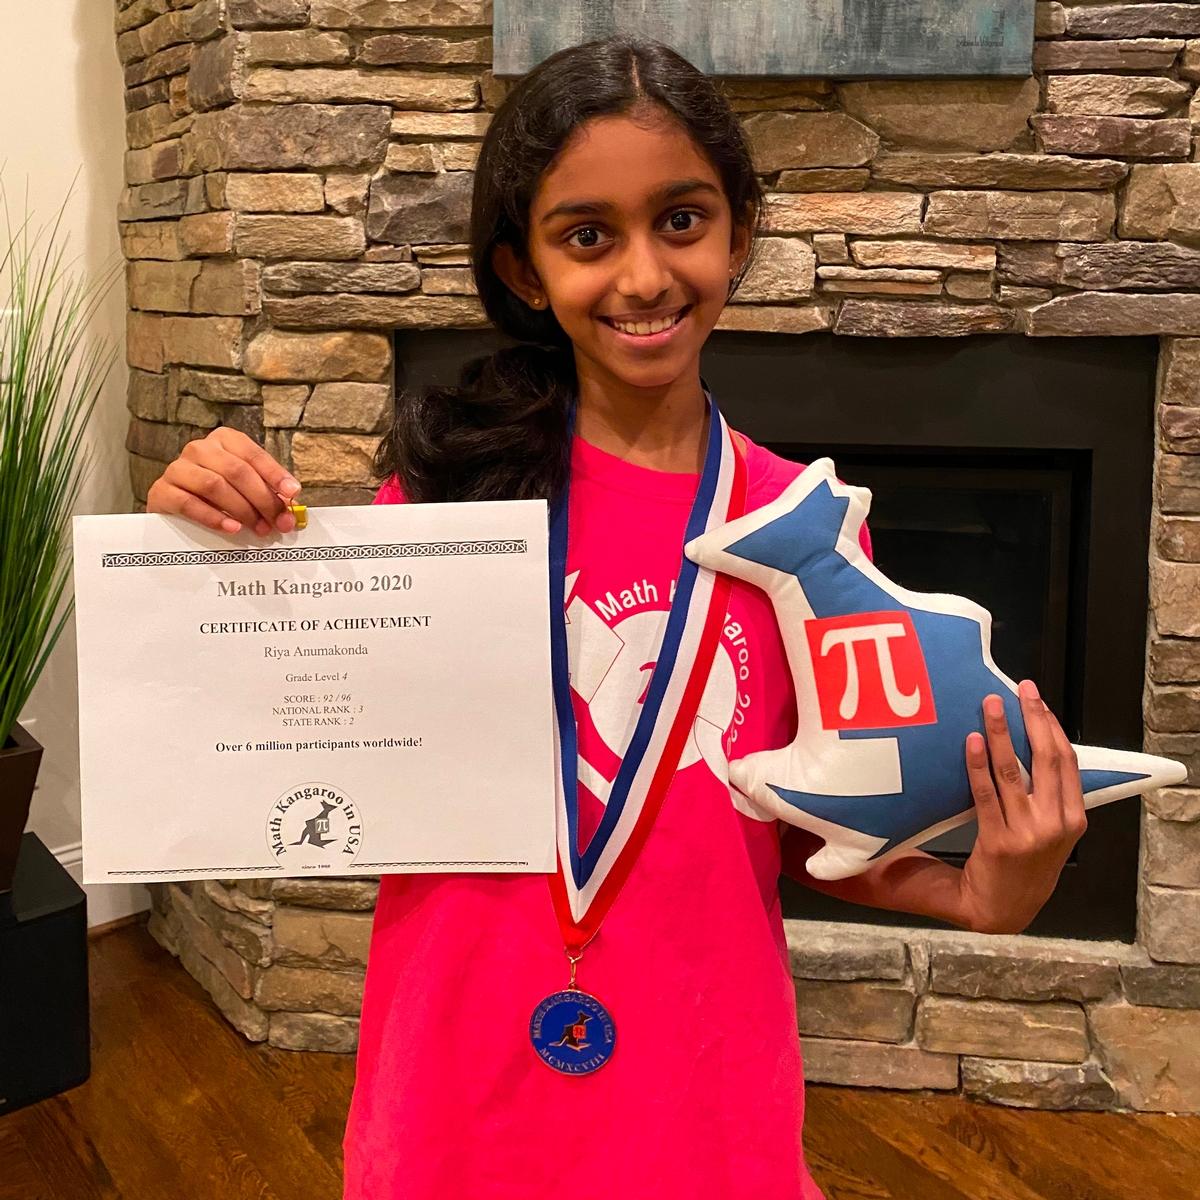 Riya Anumakonda poses with her awards